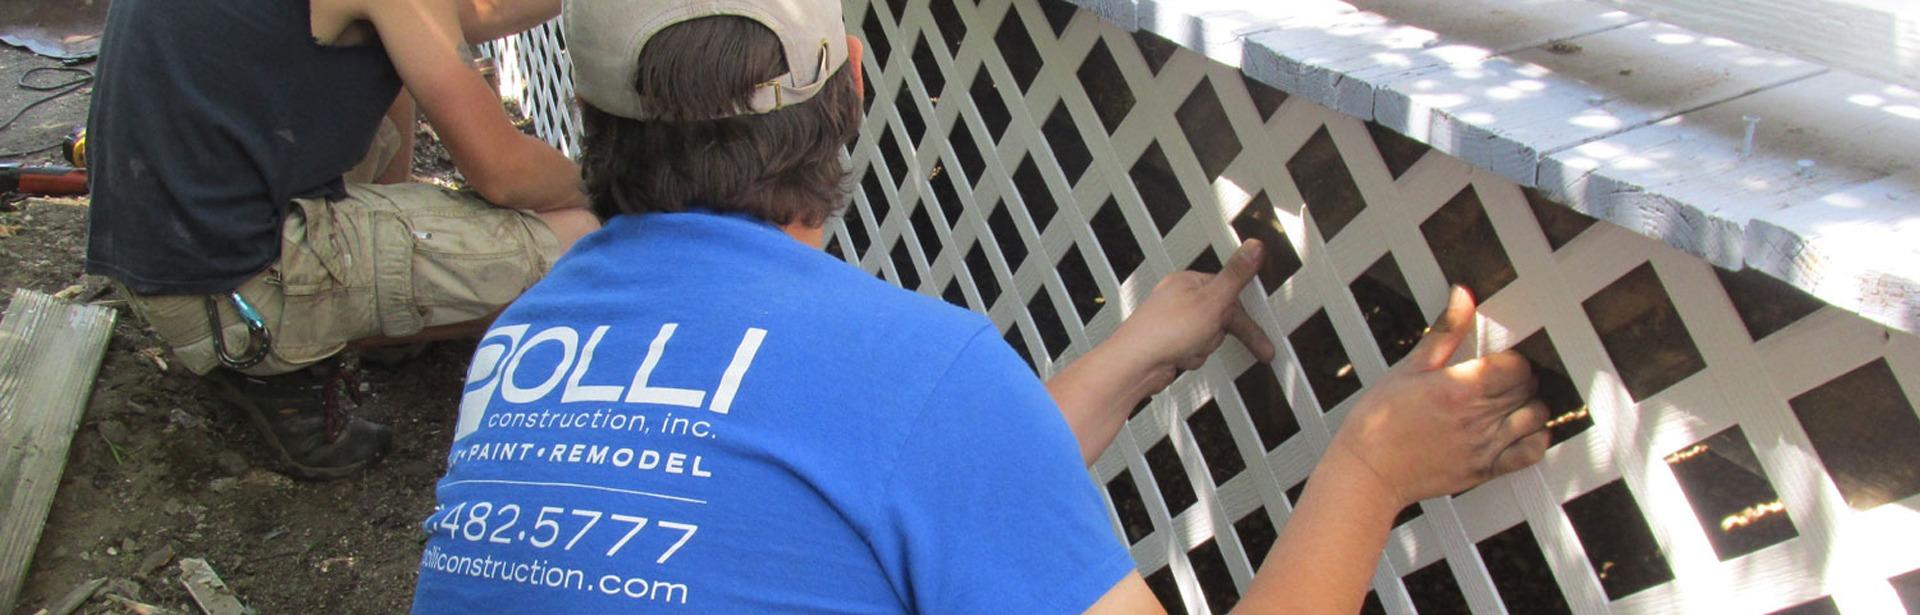 Polli Construction Handyman